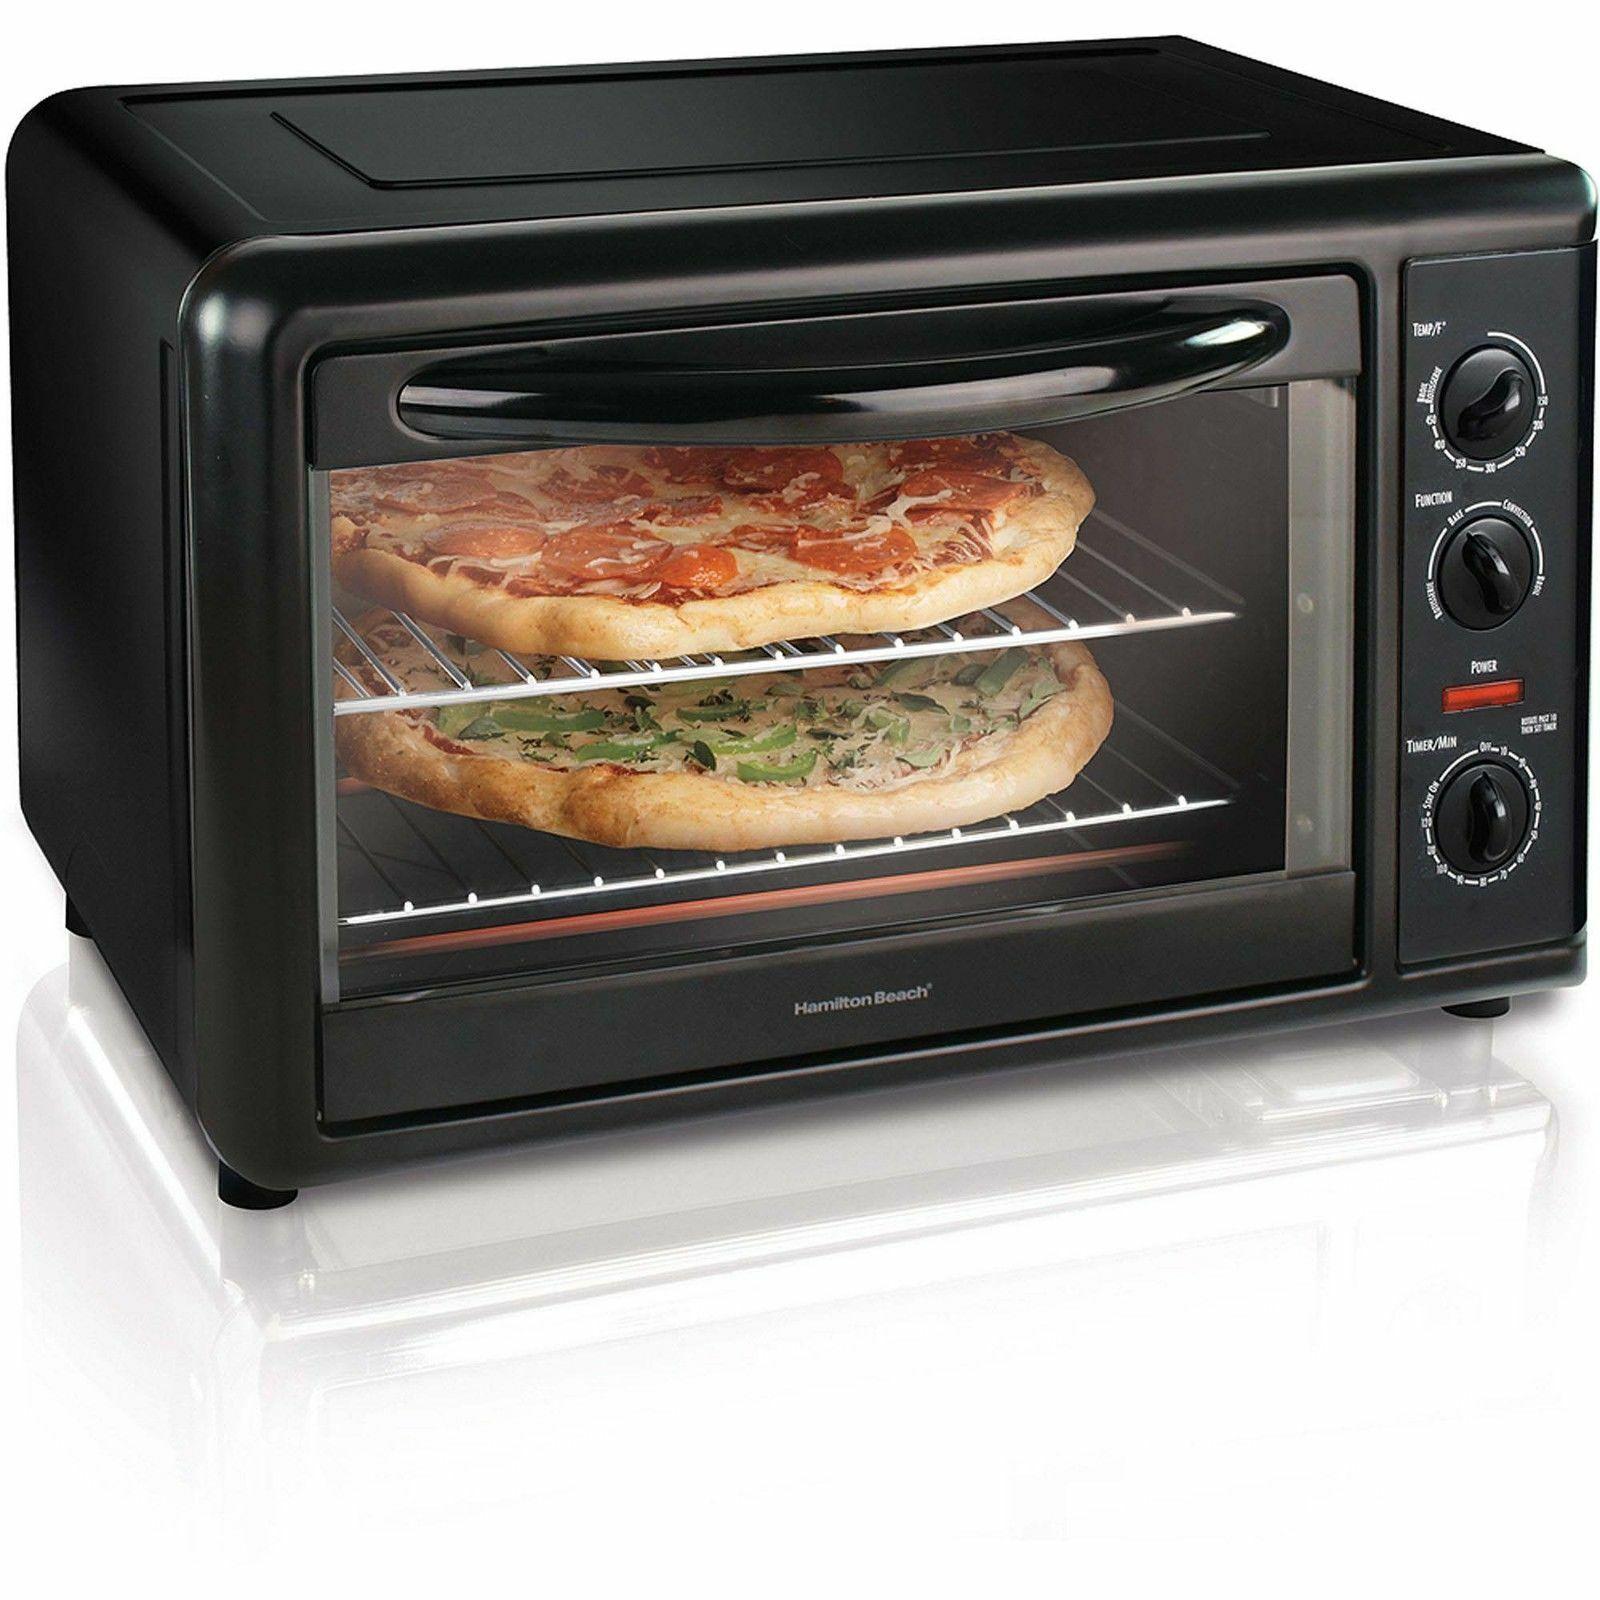 Hamilton Beach 31121A Large Capacity Countertop Oven with Co